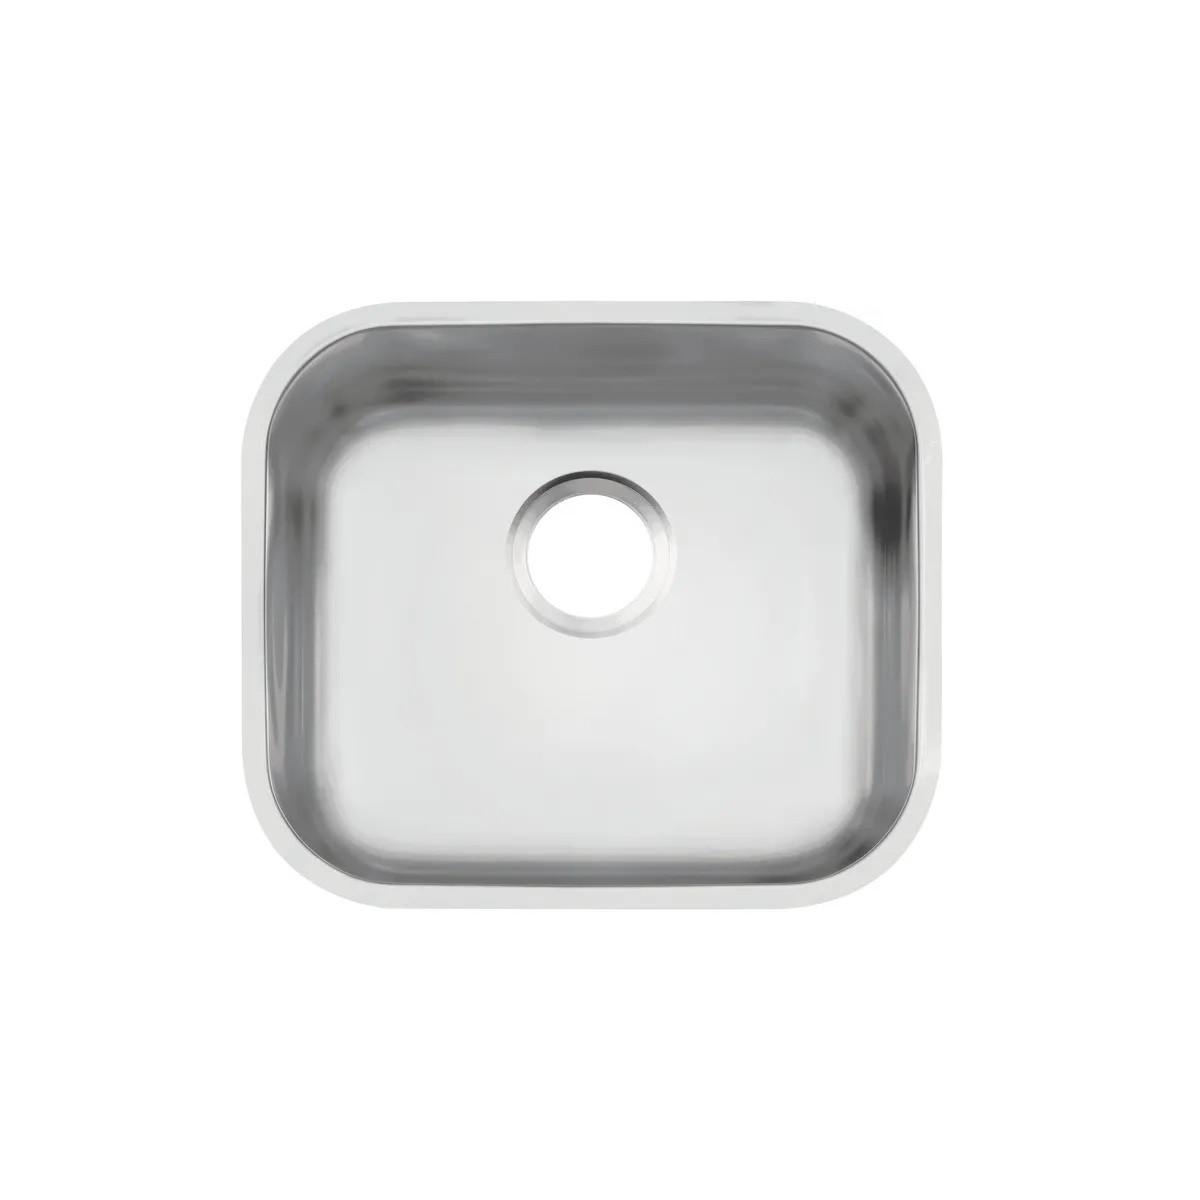 Cuba de embutir Tramontina Lavínia 40 BL em aço inox acetinado 40x34 cm 93 Tramontina 94020106